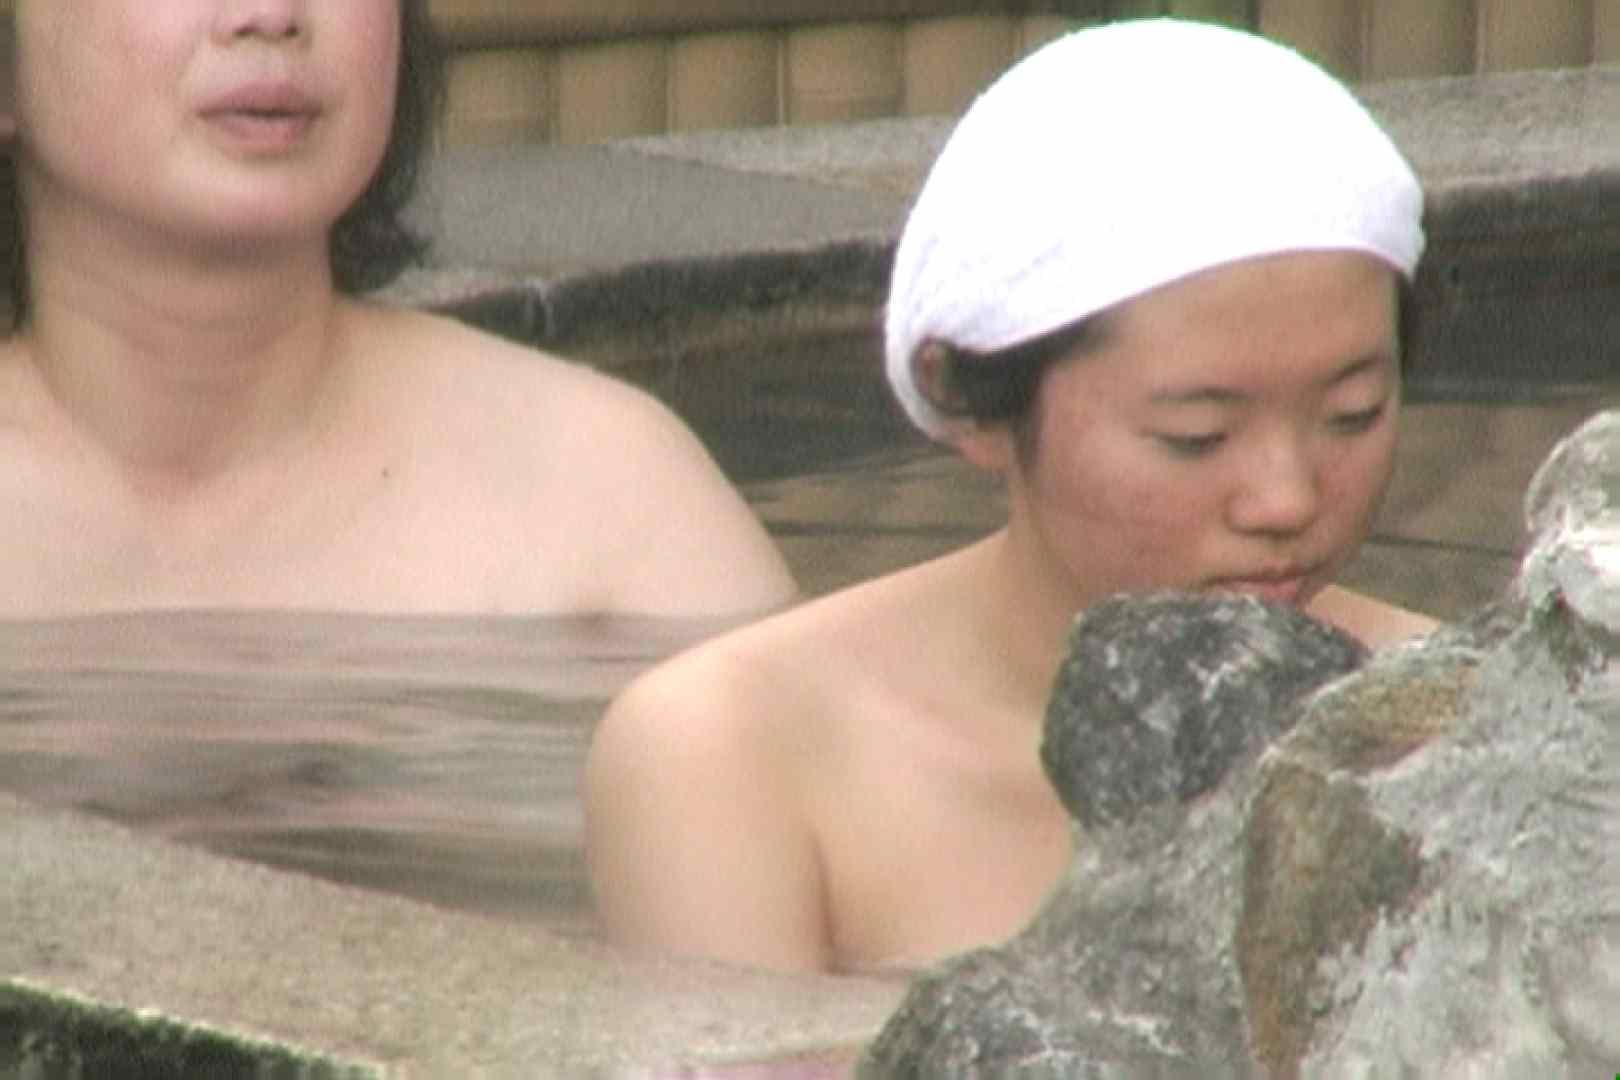 Aquaな露天風呂Vol.627 盗撮シリーズ | 露天風呂編  85PIX 81